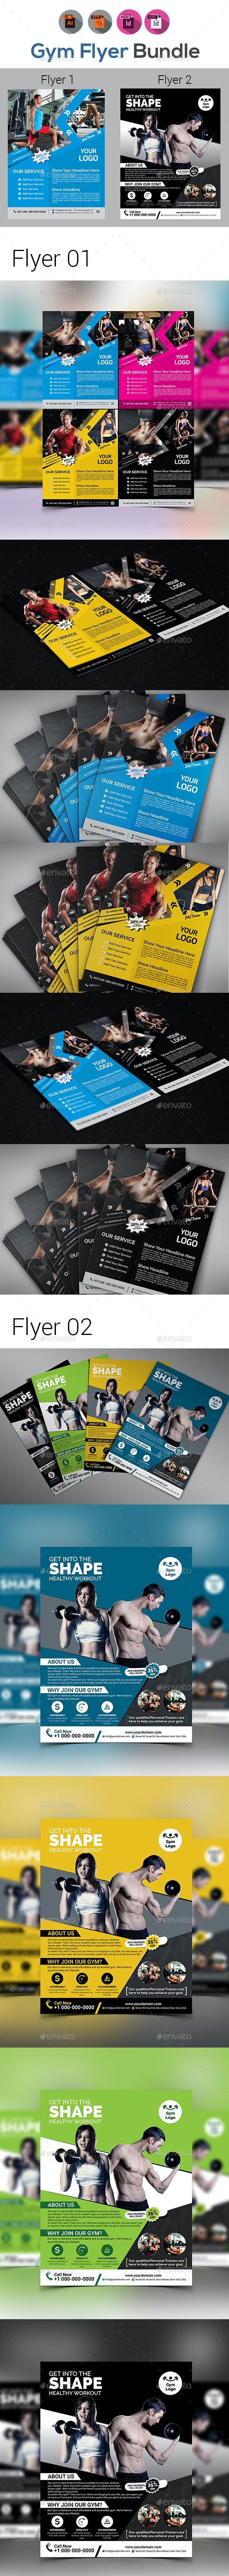 Fitness & Gym Flyer Bundle - Sports Events